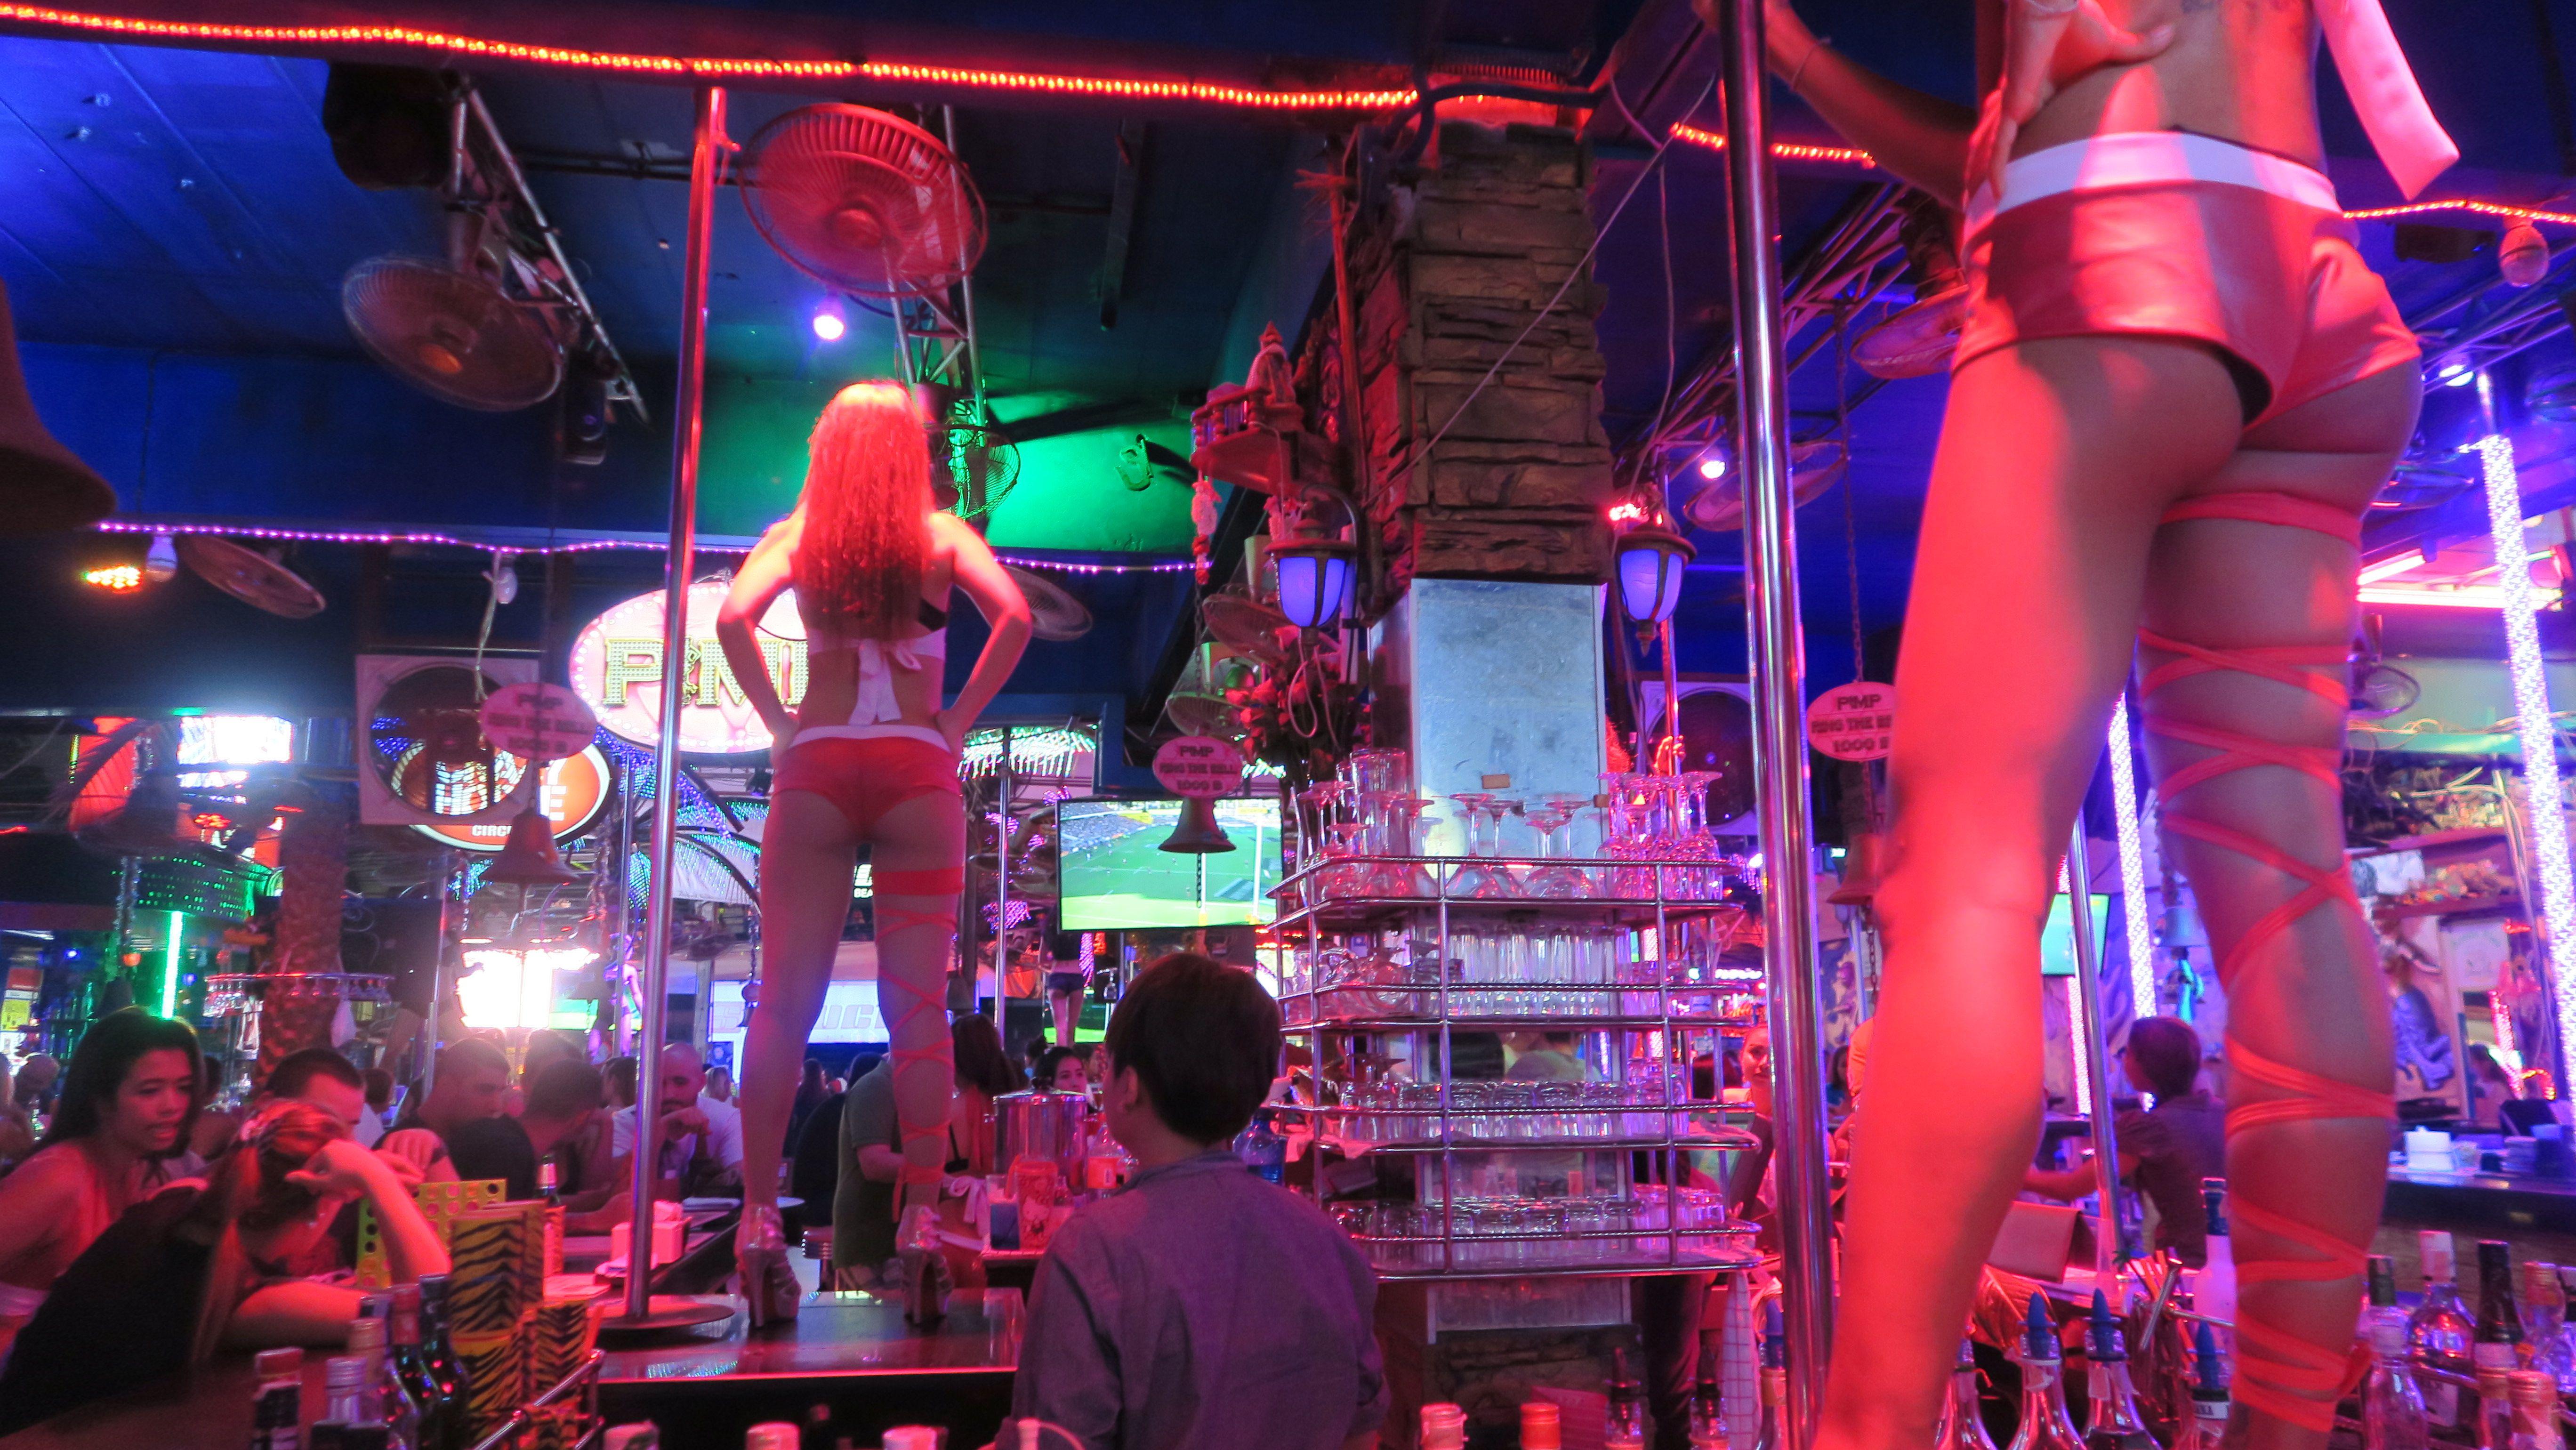 Cabaret club dancing girls sex voyeur - 1 8